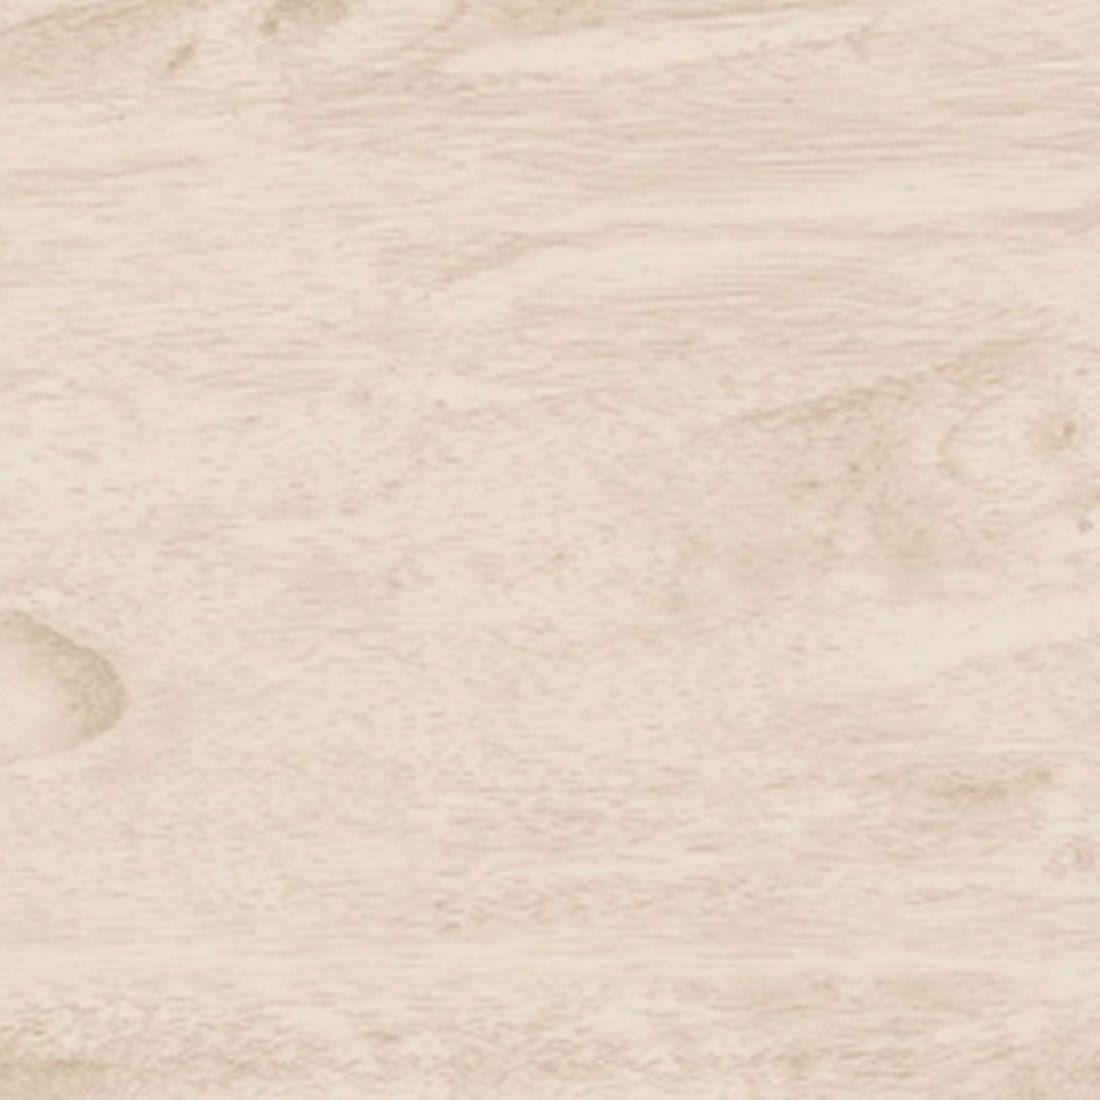 Porcelanato Elizabeth Legno Bianco Acetinado 50x50 Com 1,52mts na Caixa